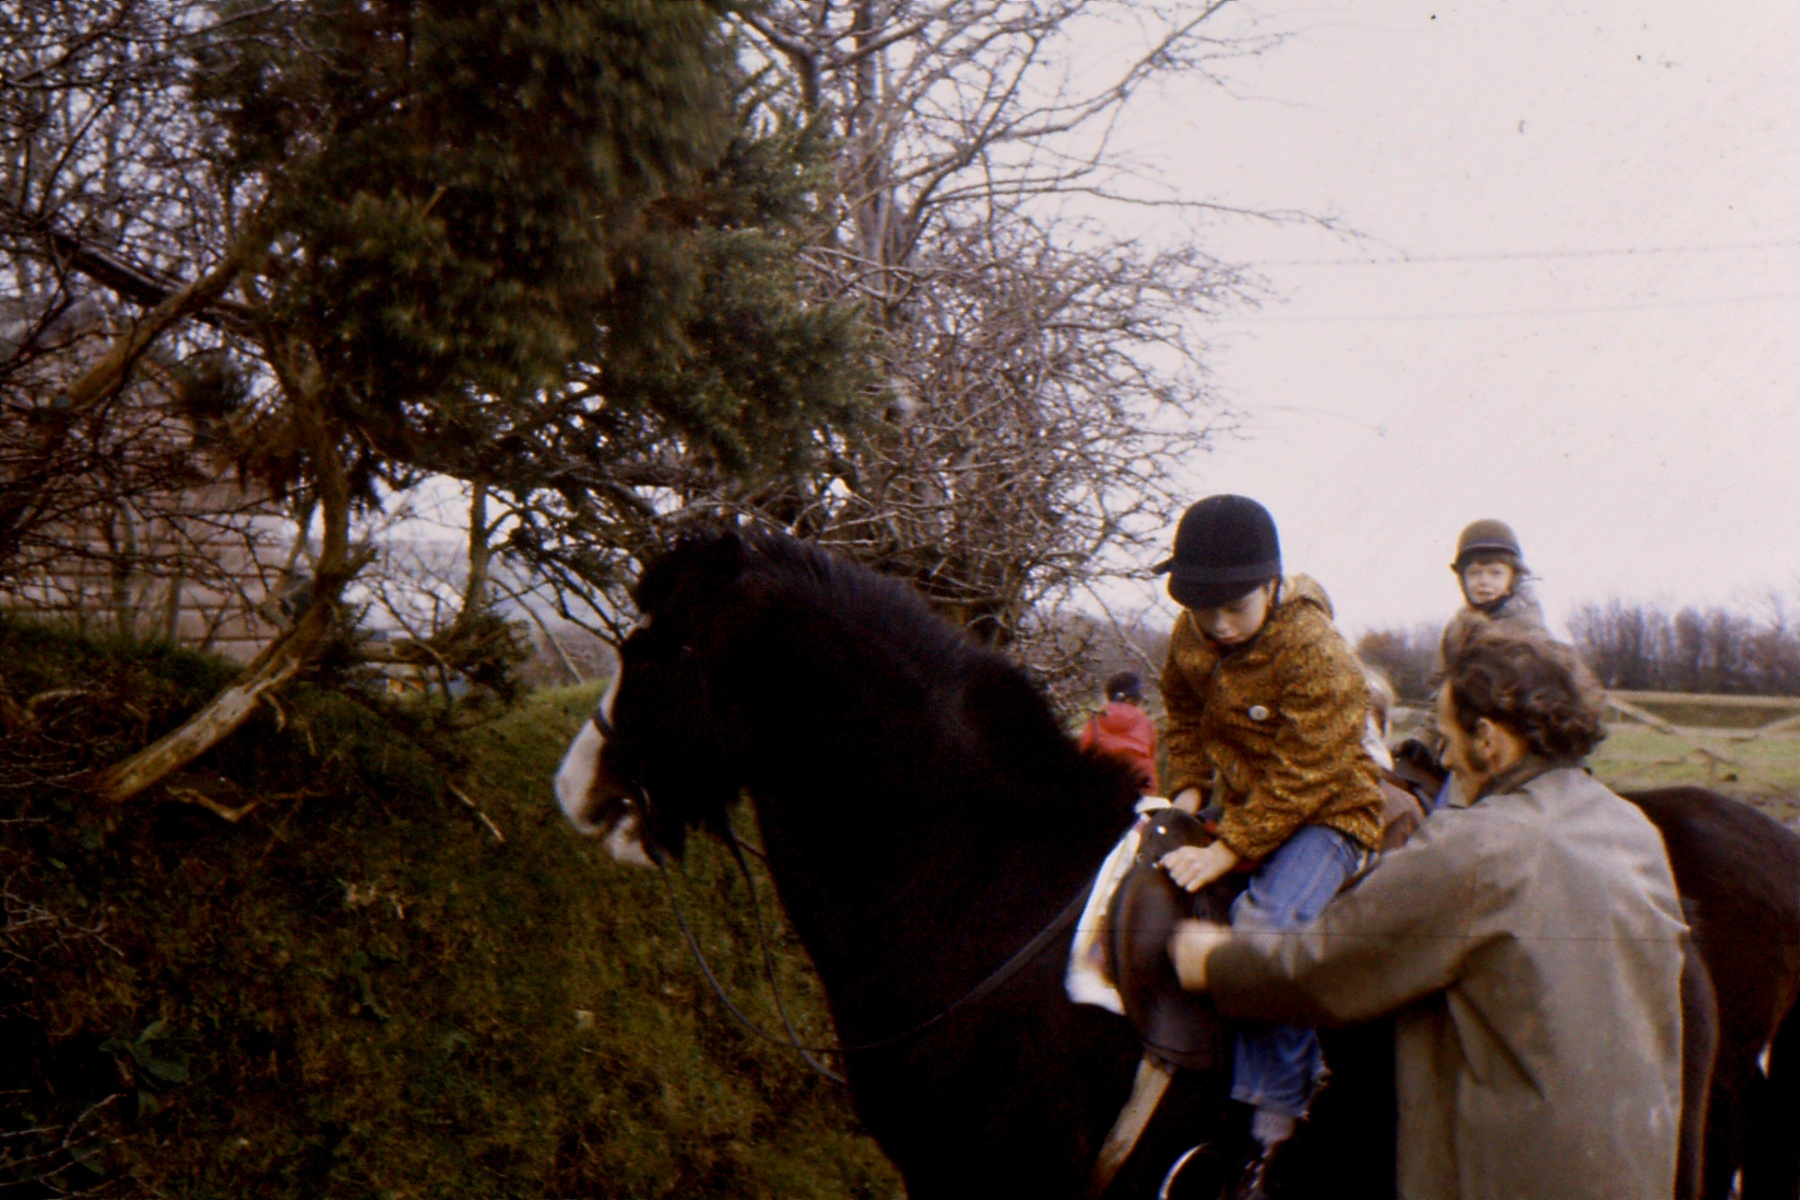 1966-69 Middle Barton School - Field trip to Yenworthy, Somerset - Pony trekking.